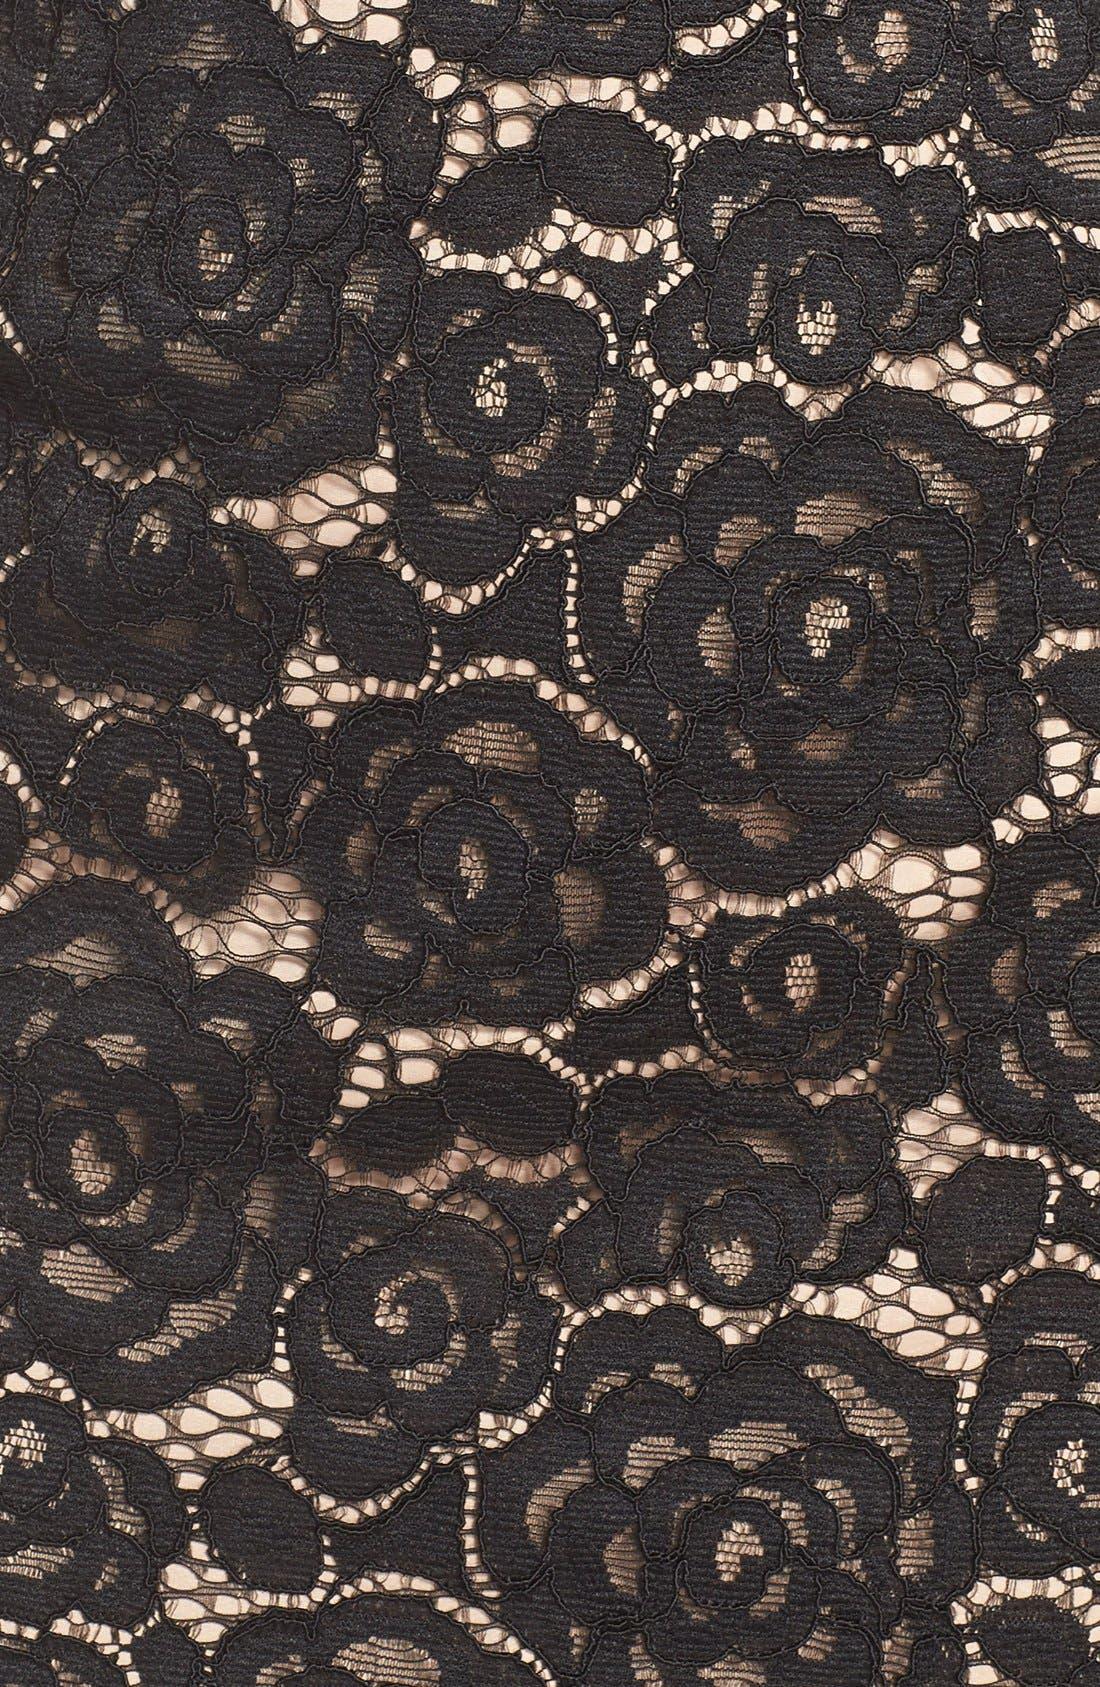 Off the Shoulder Lace Sheath Dress,                             Alternate thumbnail 2, color,                             003